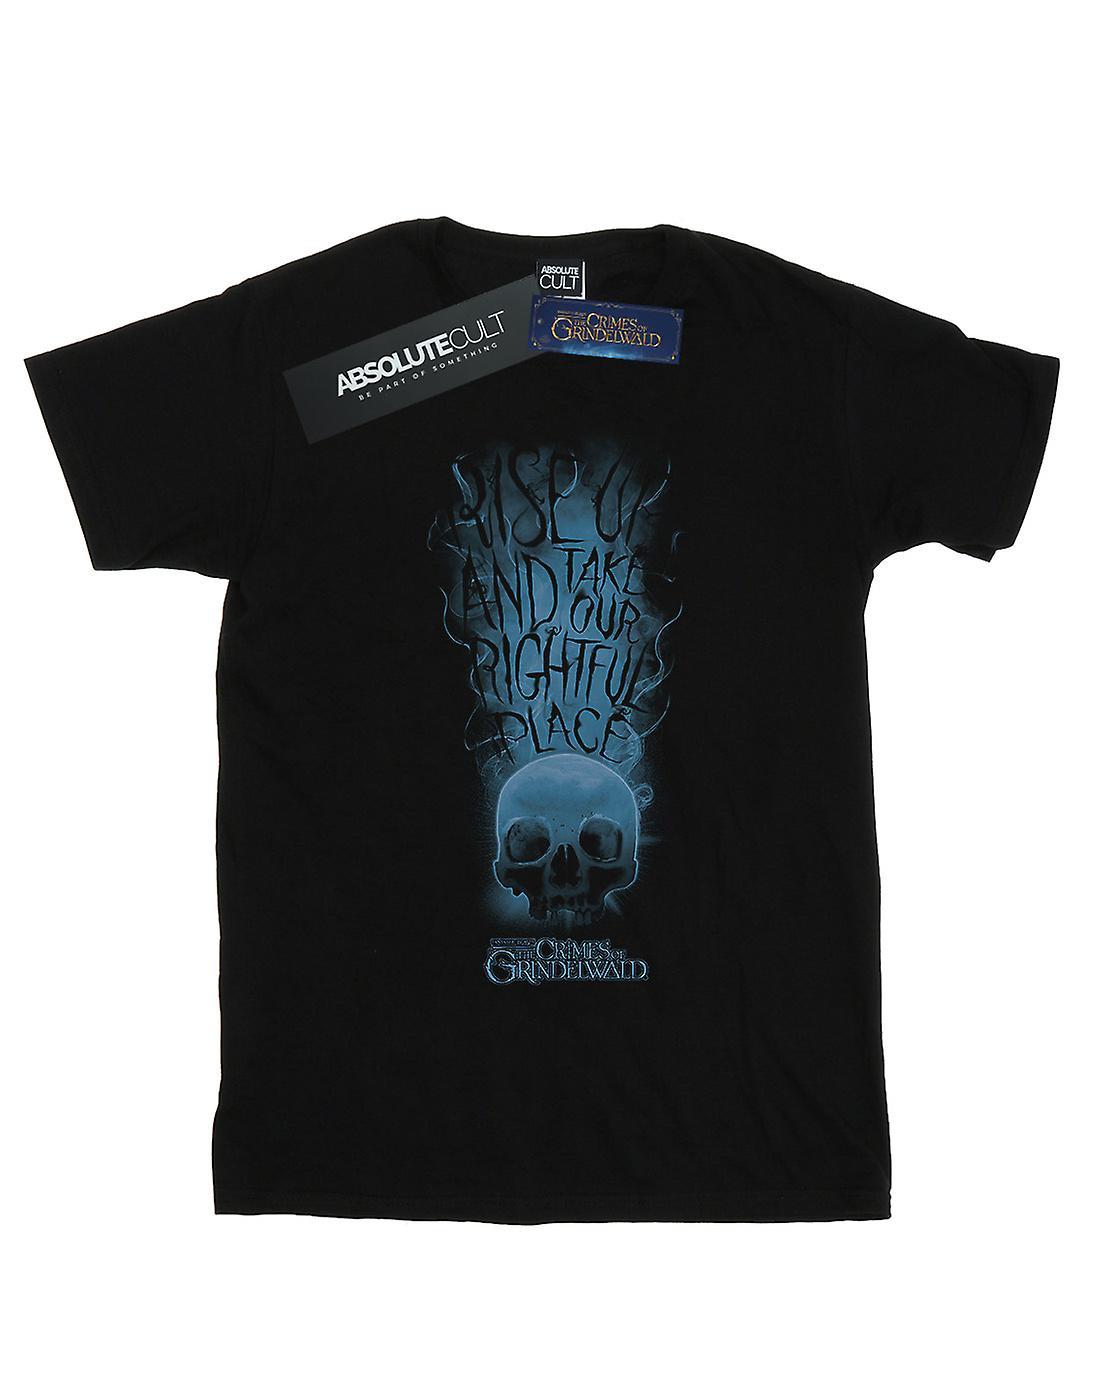 Fantastic Beasts Women's The Crimes Of Grindelwald Skull Smoke Boyfriend Fit T-Shirt